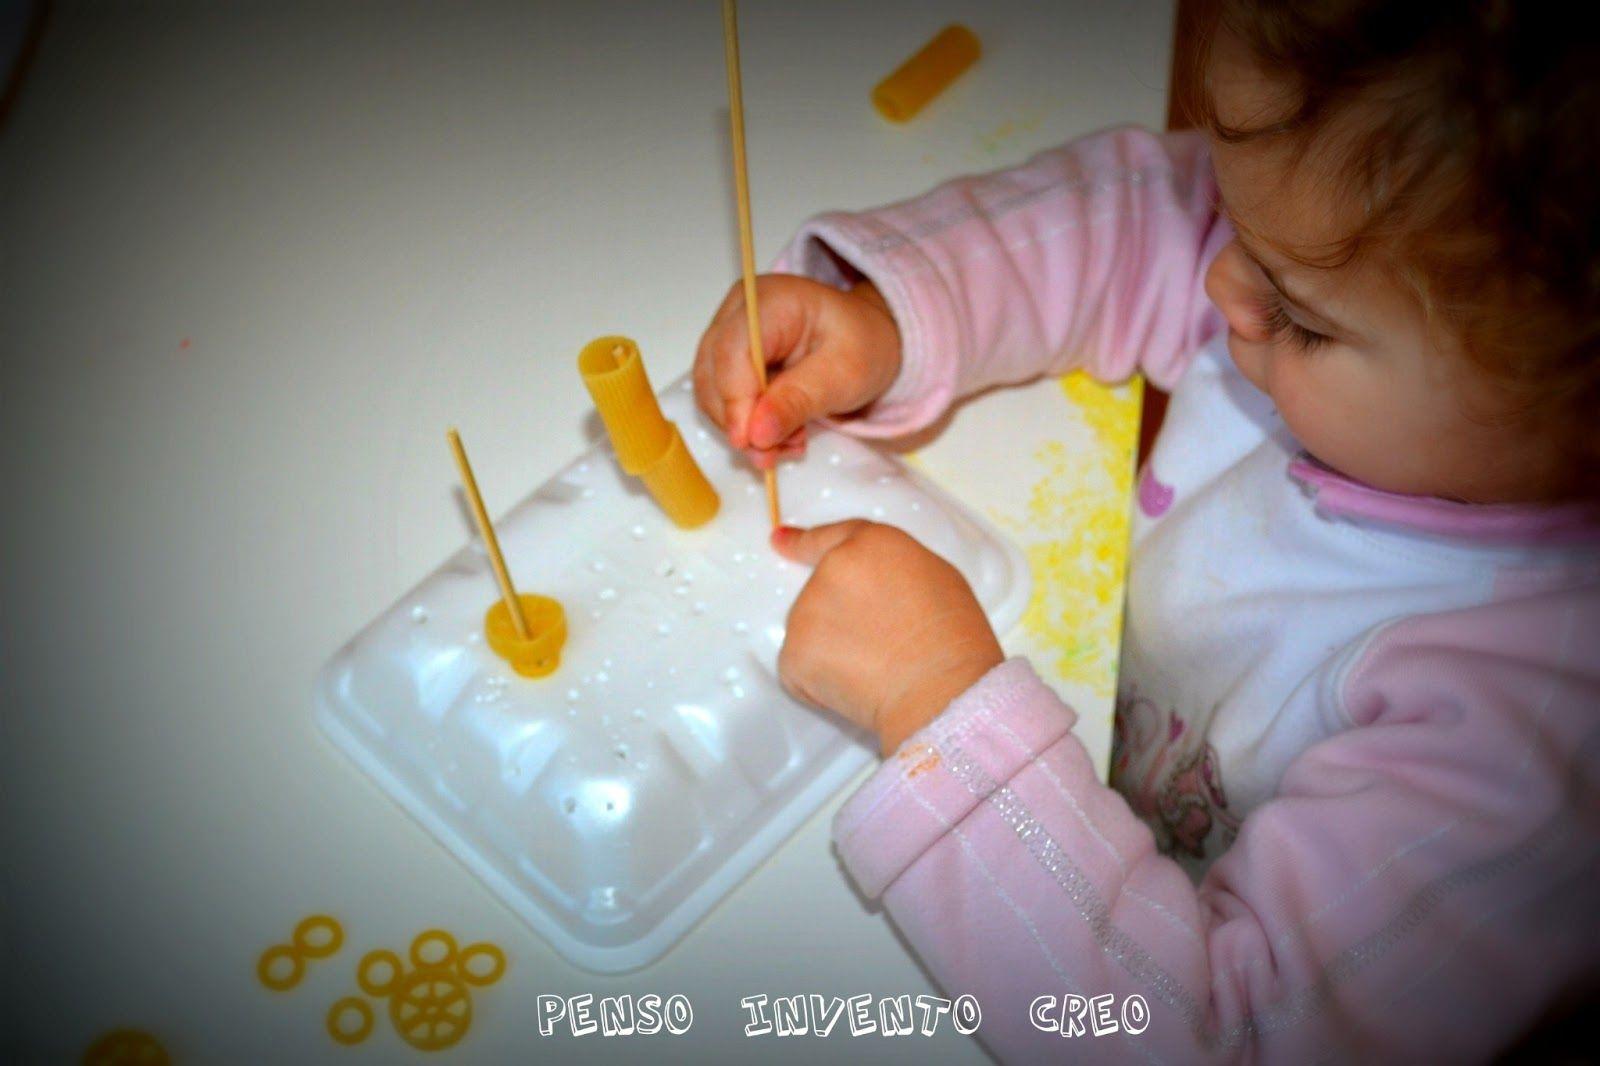 3 Indoor Activity For Toddler 3 Giochi Per Bambini Con Meno